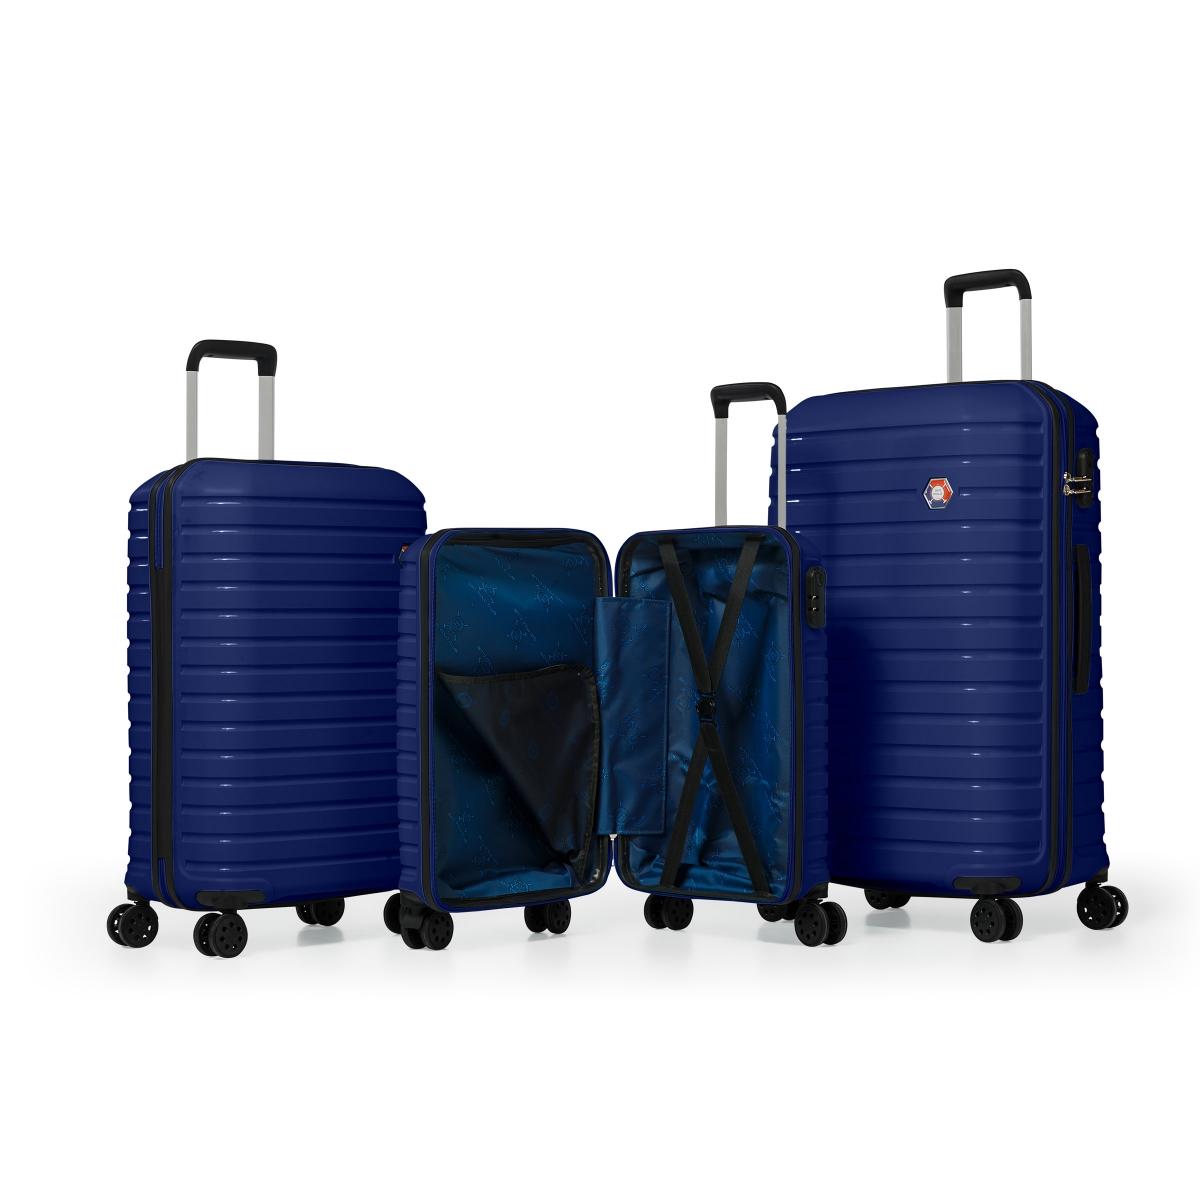 G&D Polo Suitcase PP Enjeksiyon 3'lü Valiz Seyahat Seti - Model 400.04 Lacivert